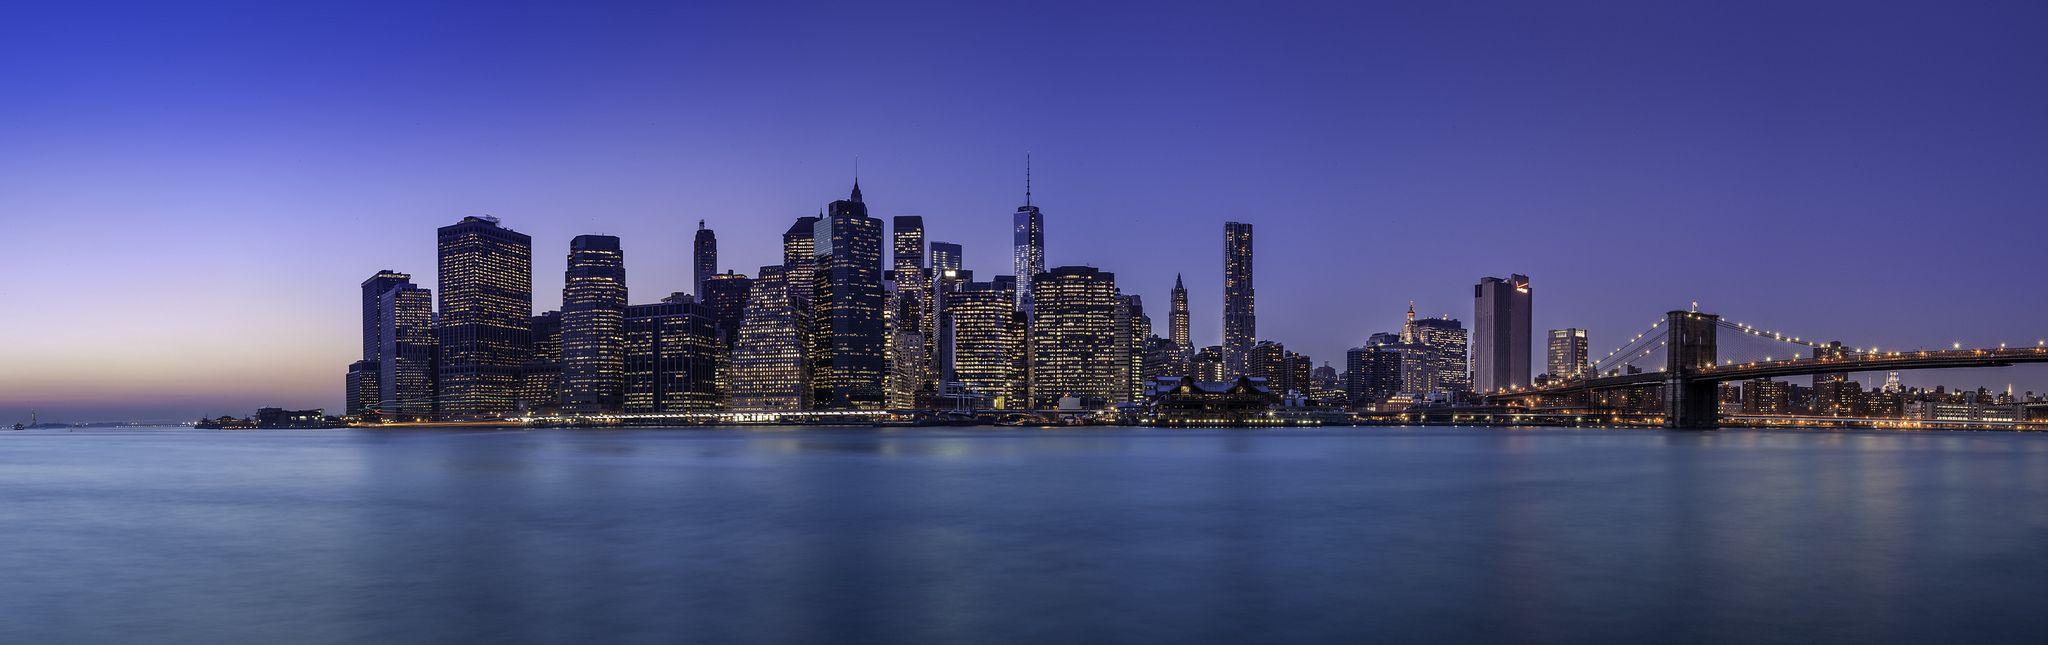 New York Panorama Pix - Page 56 - SkyscraperCity